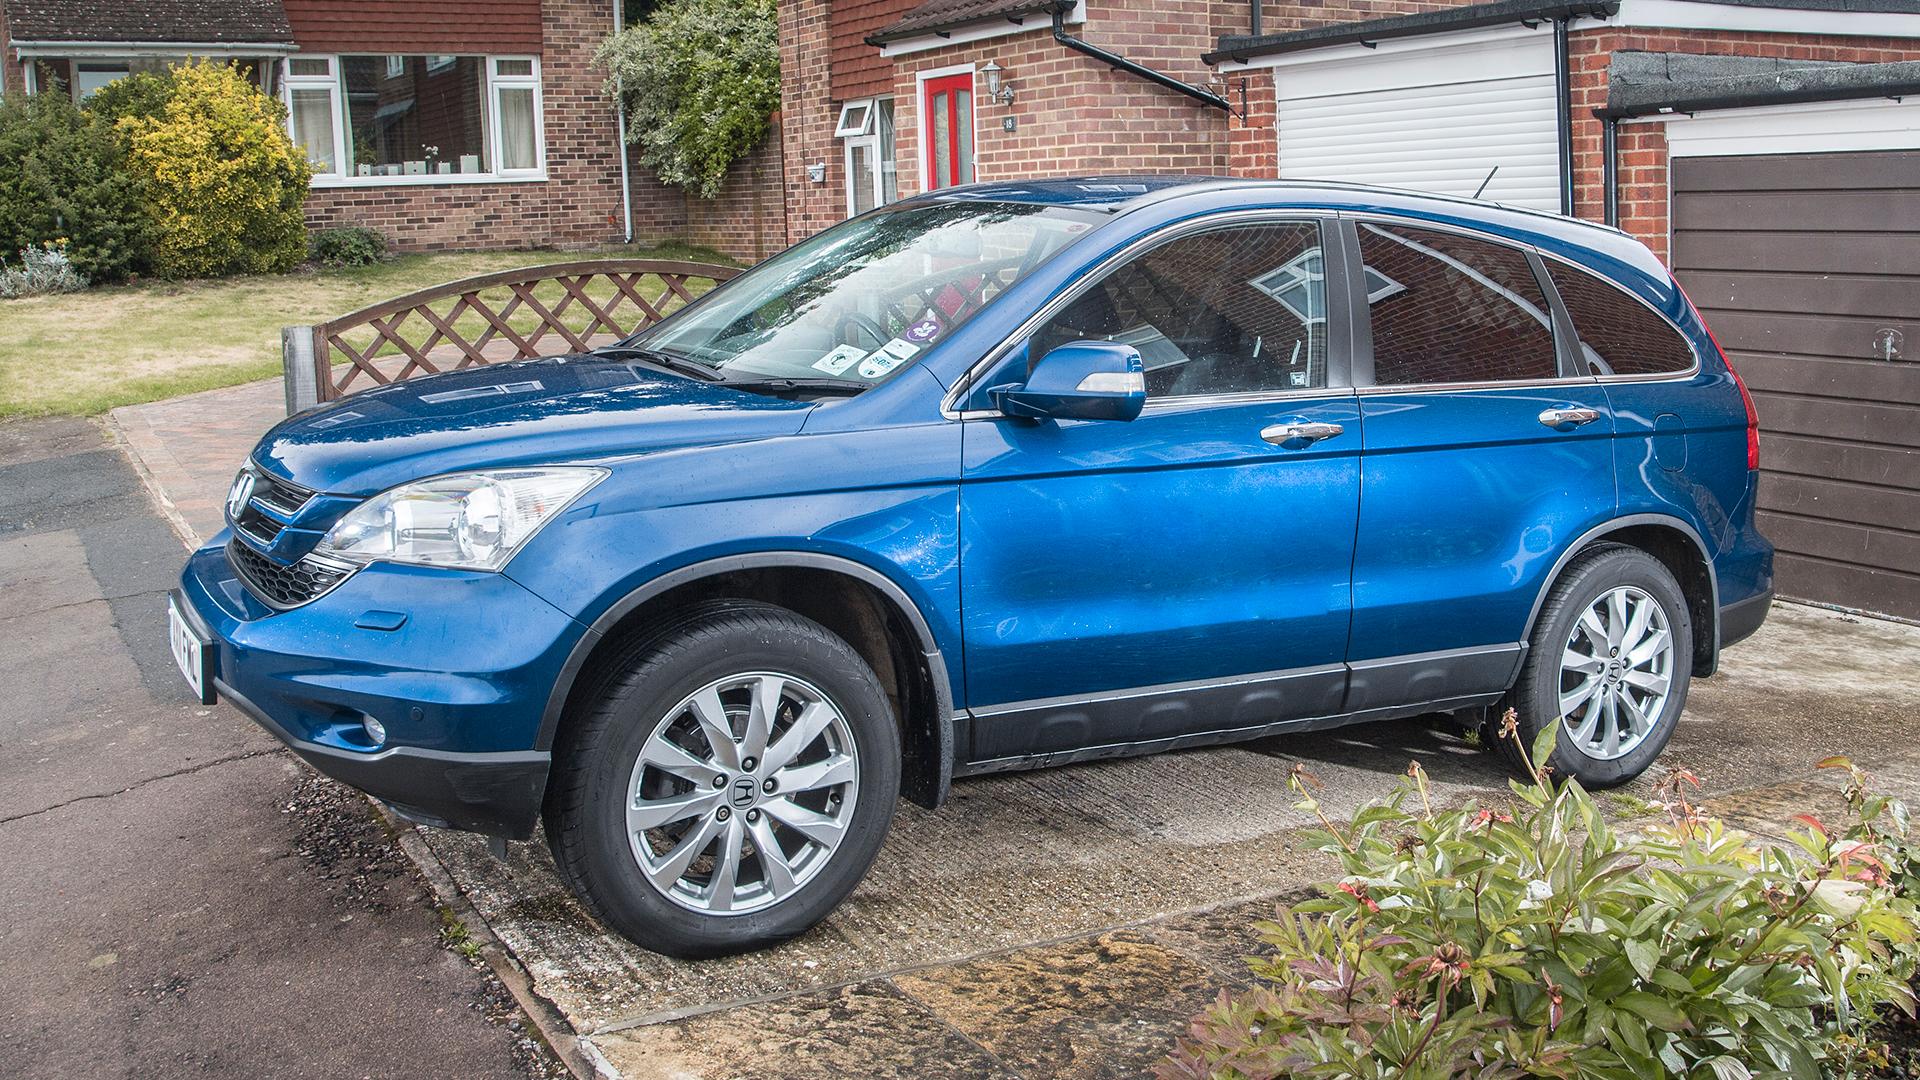 Best 4x4 cars 2020 | Auto Trader UK